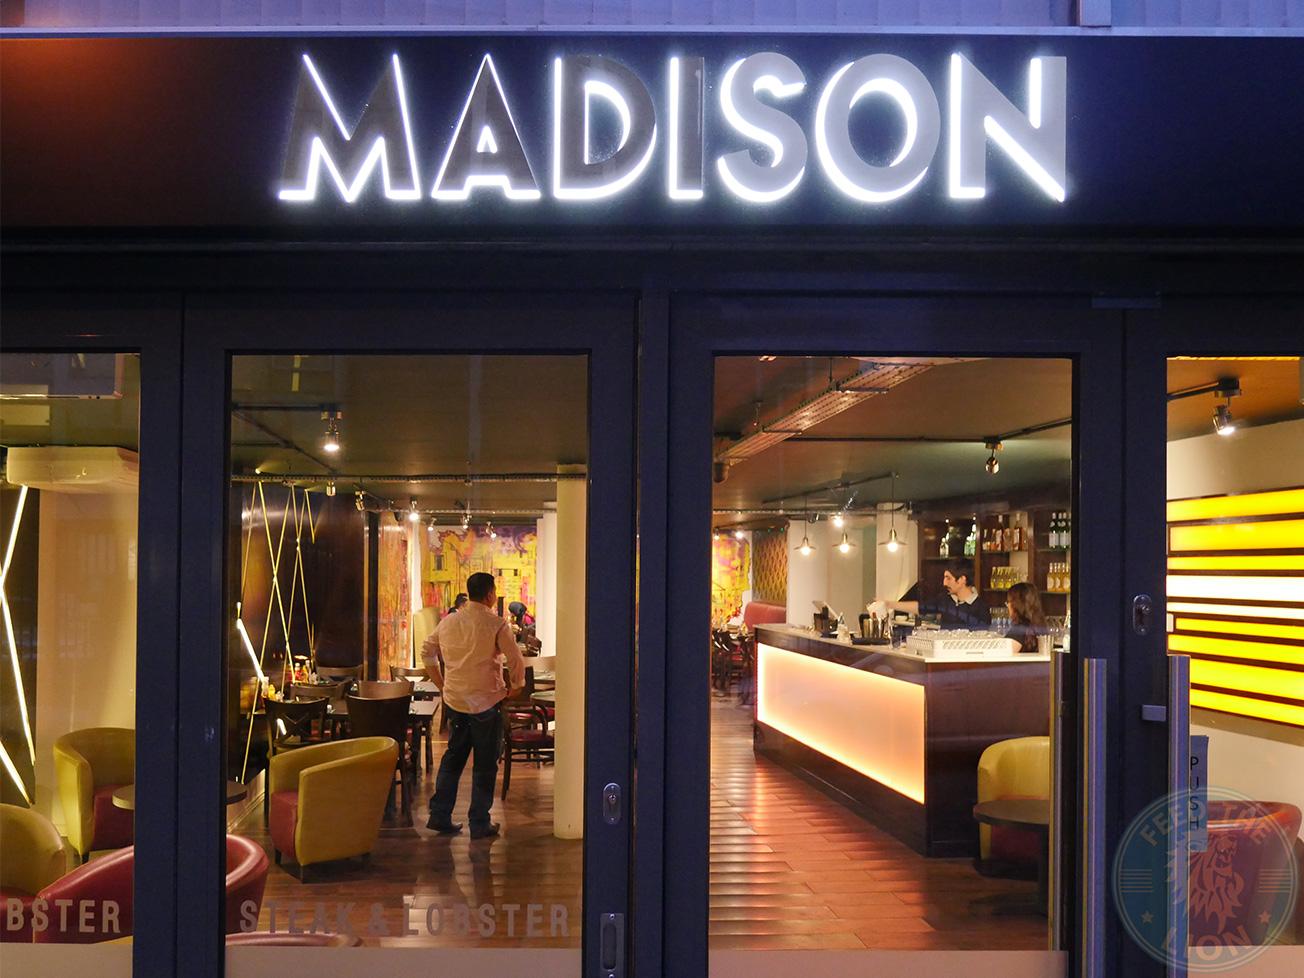 Le Madison (Steak & Lobster) - Whitechapel - Feed the Lion